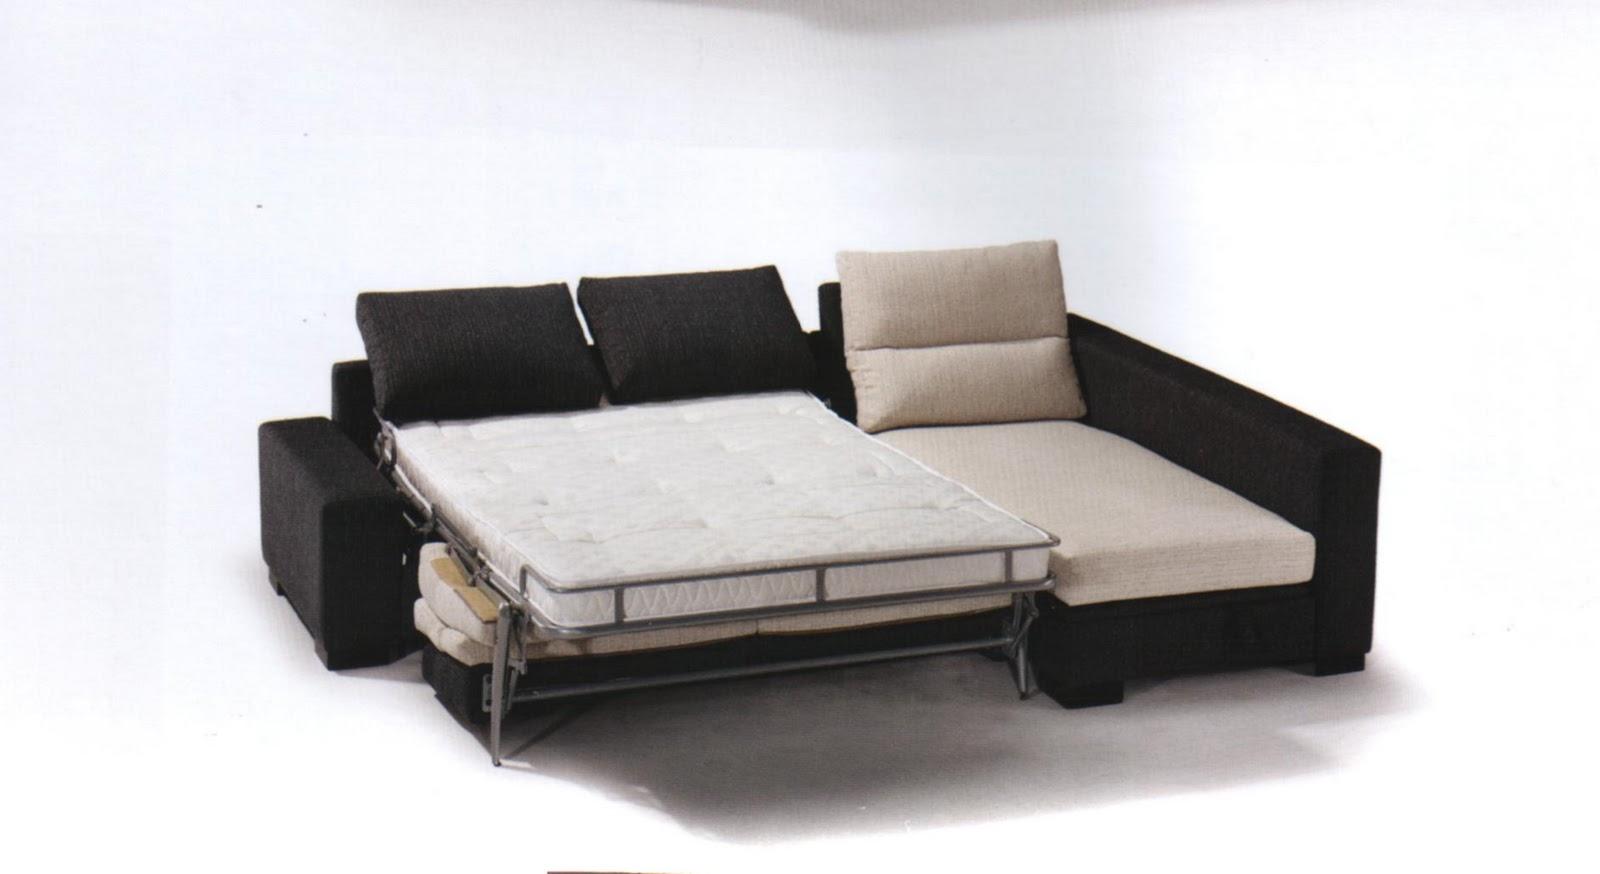 Muebles vilu convertible en cama for Muebles convertibles